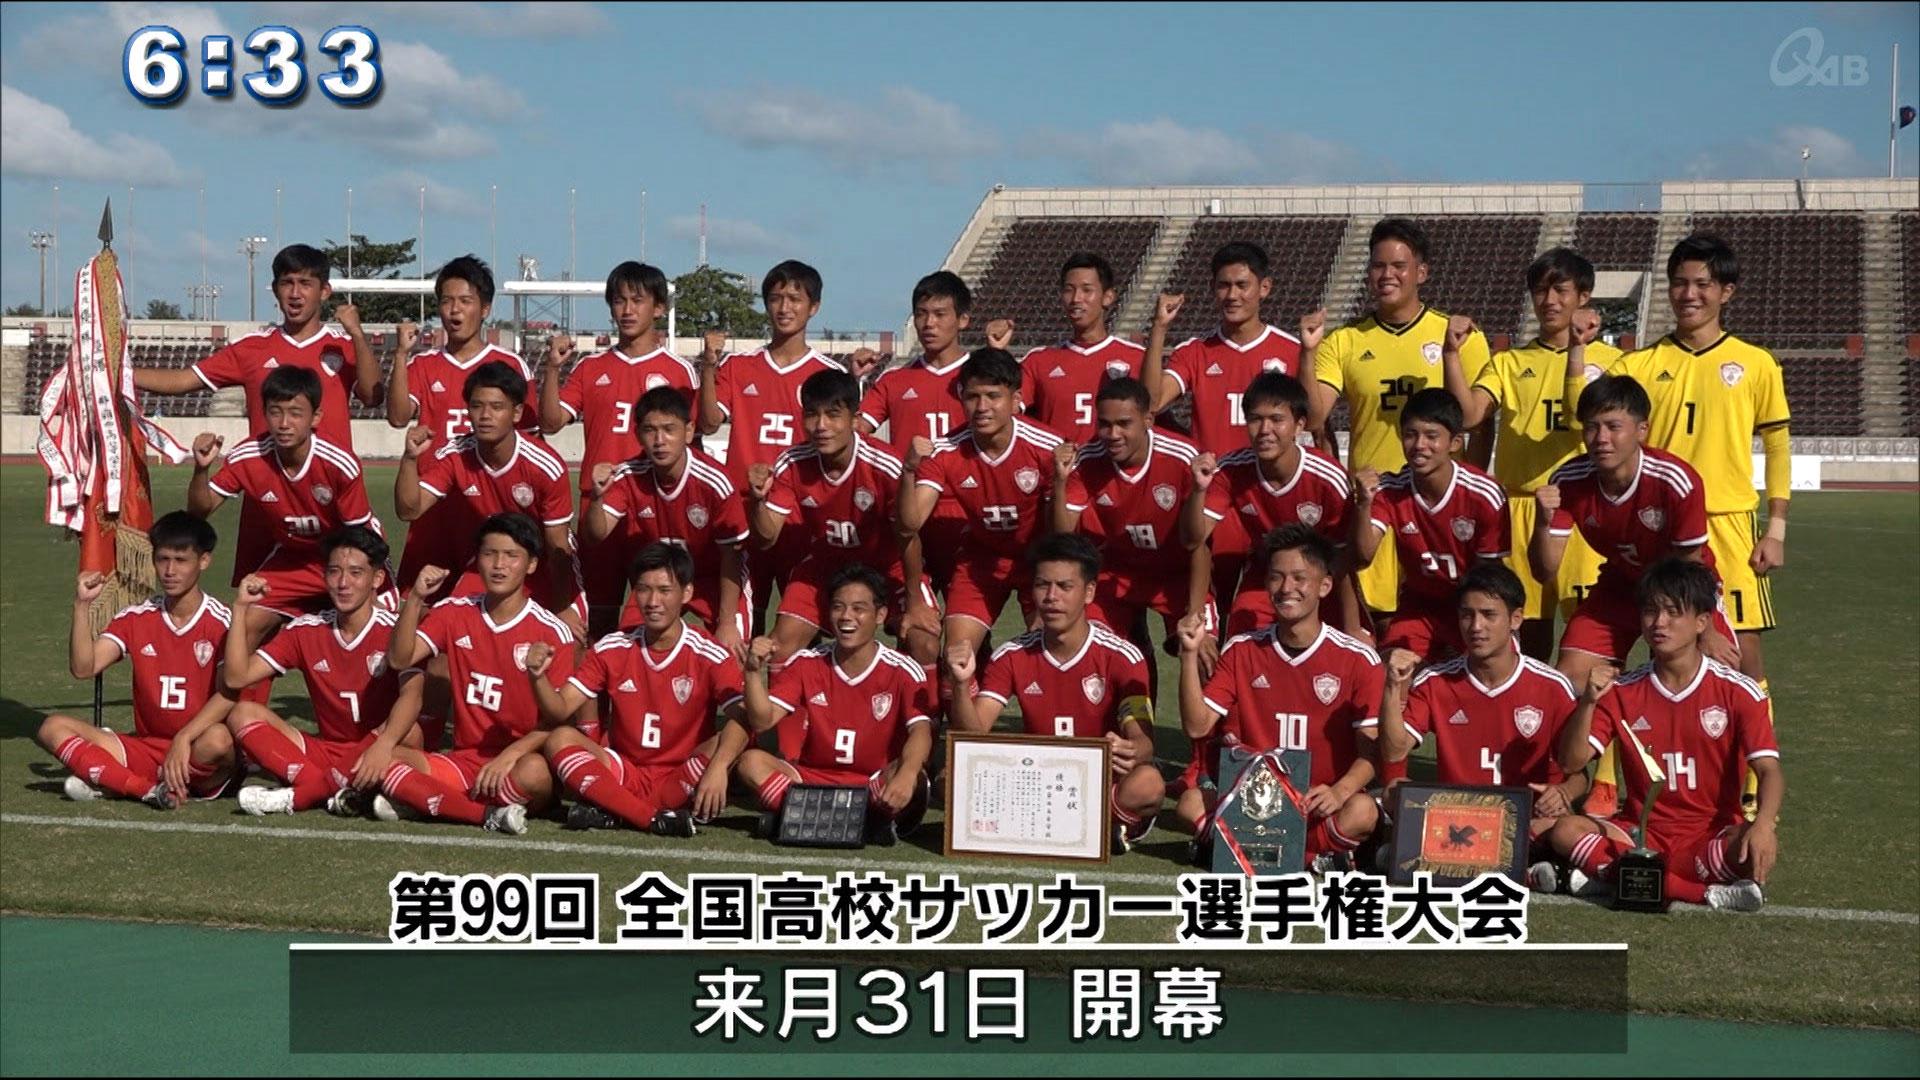 全国高校サッカー選手権沖縄県大会